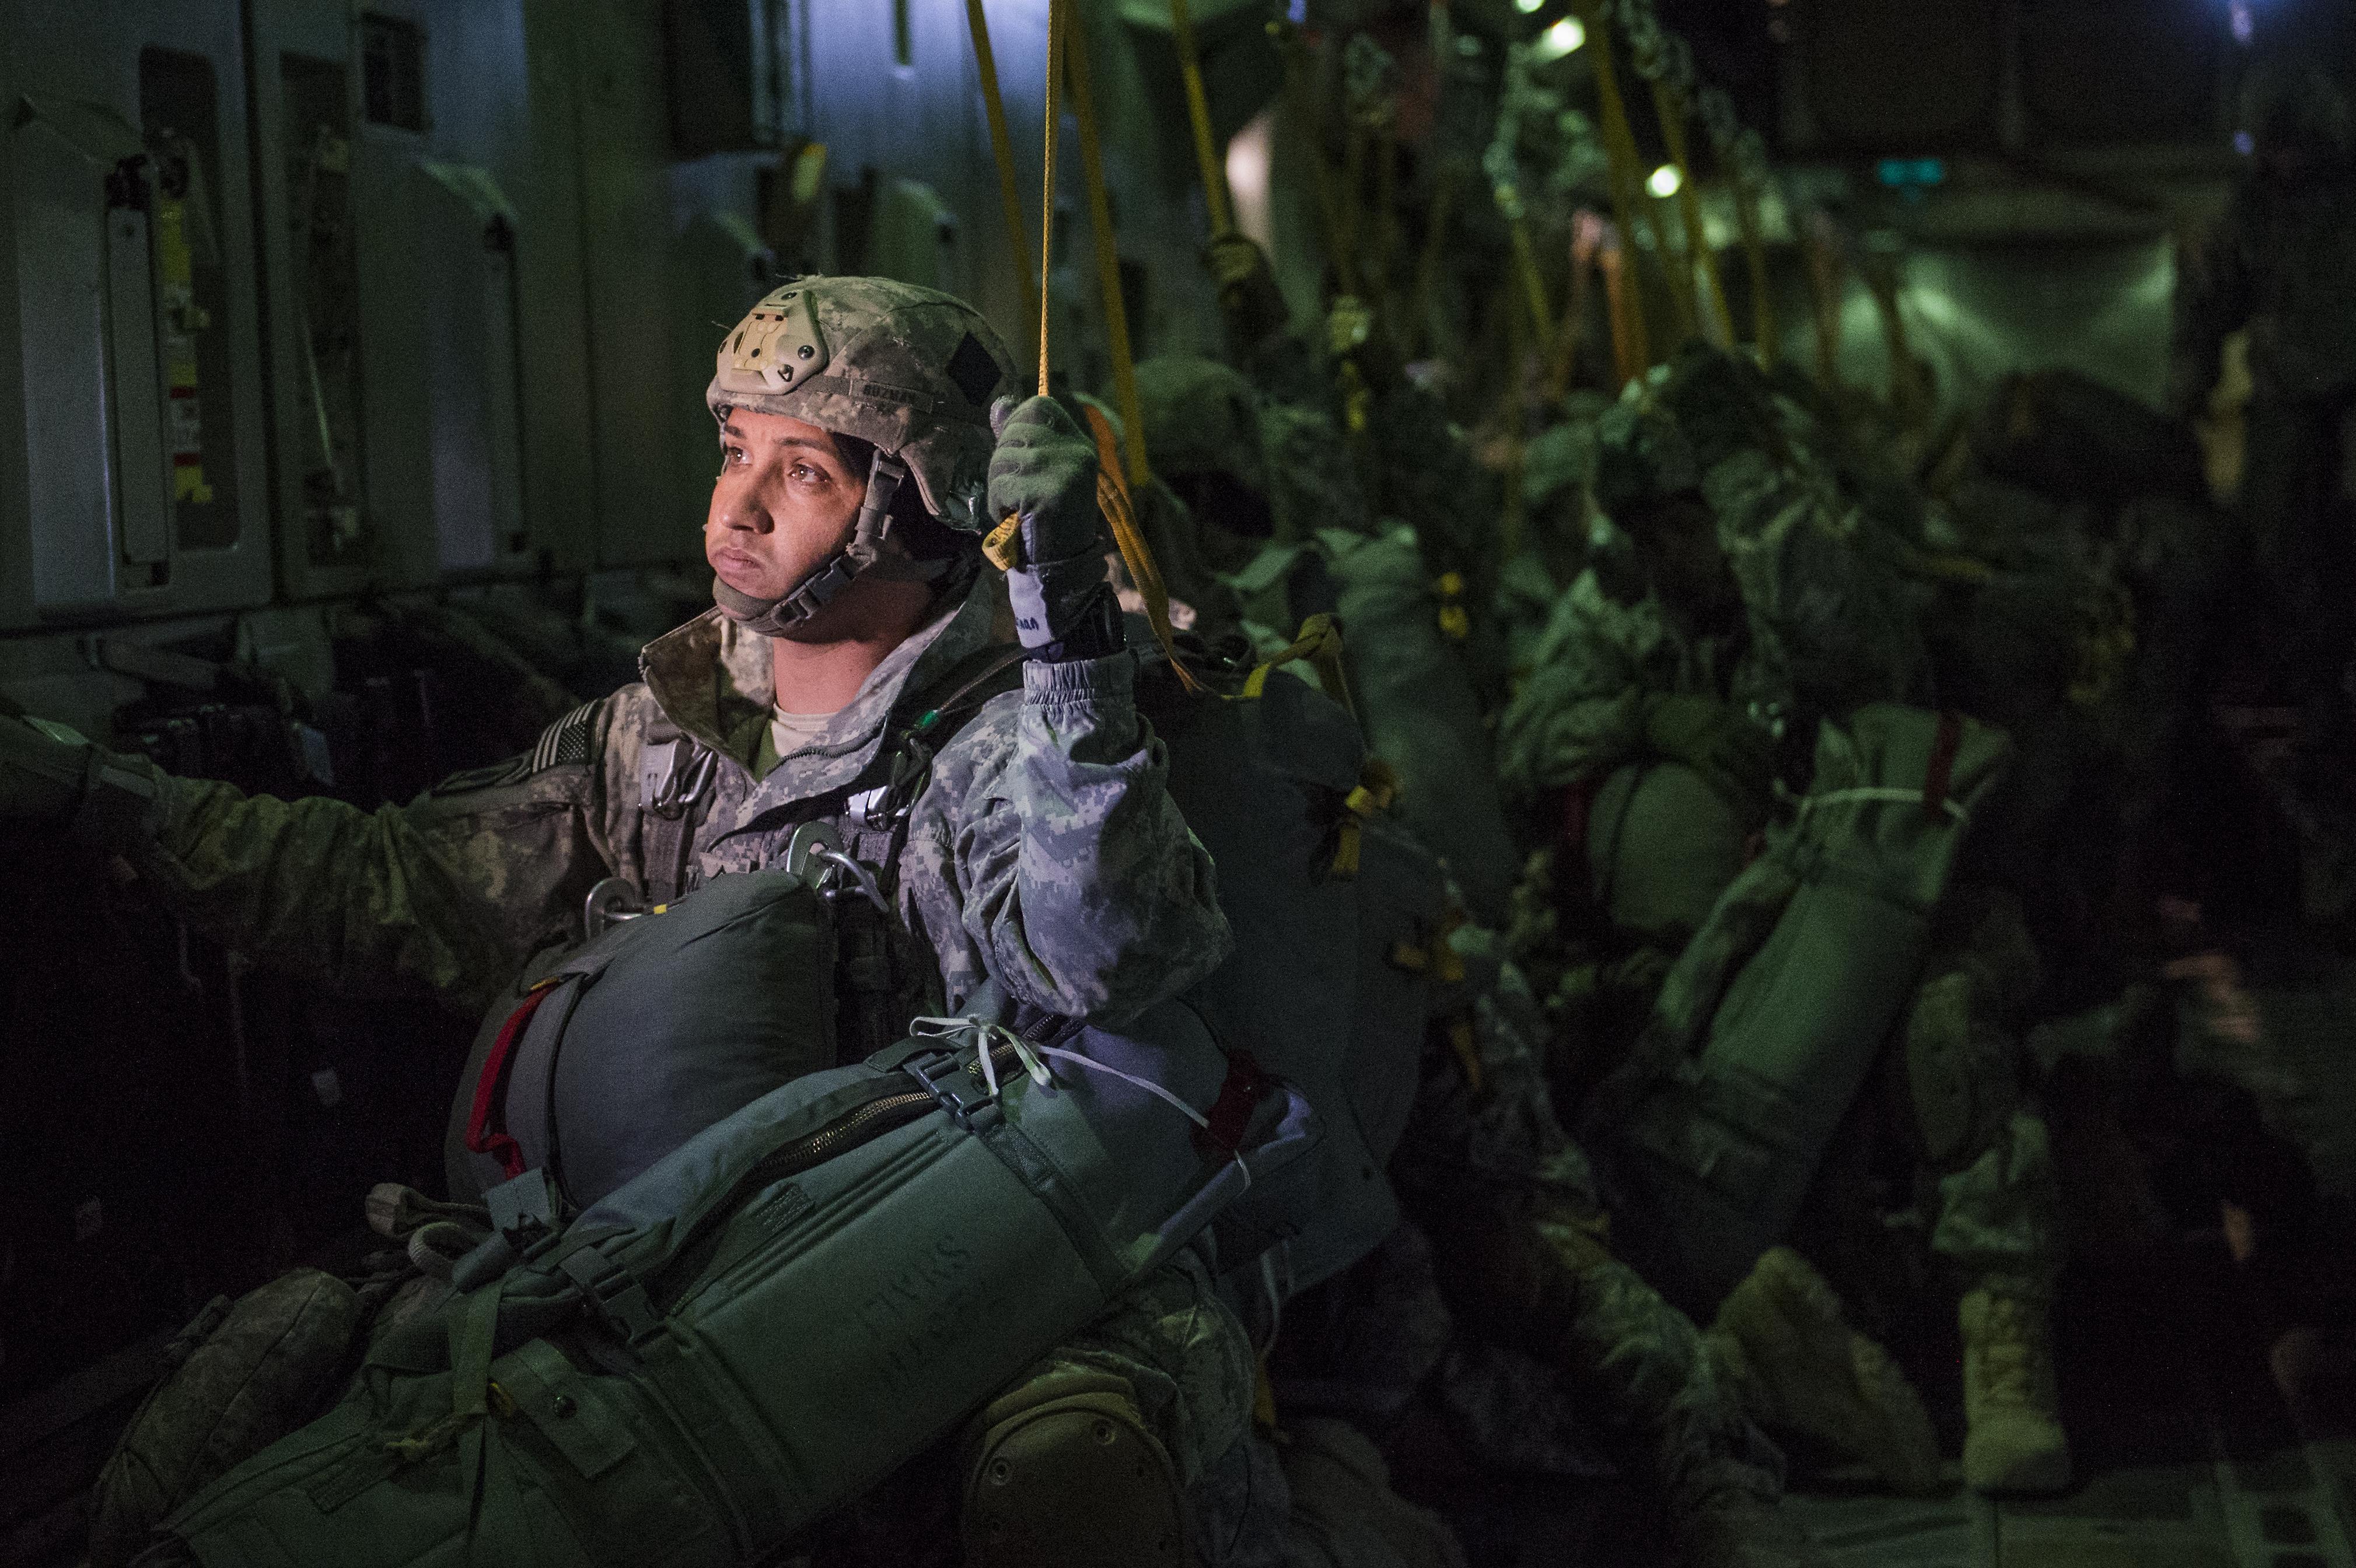 Joint Base Elmendorf-Richardson's airborne contribution